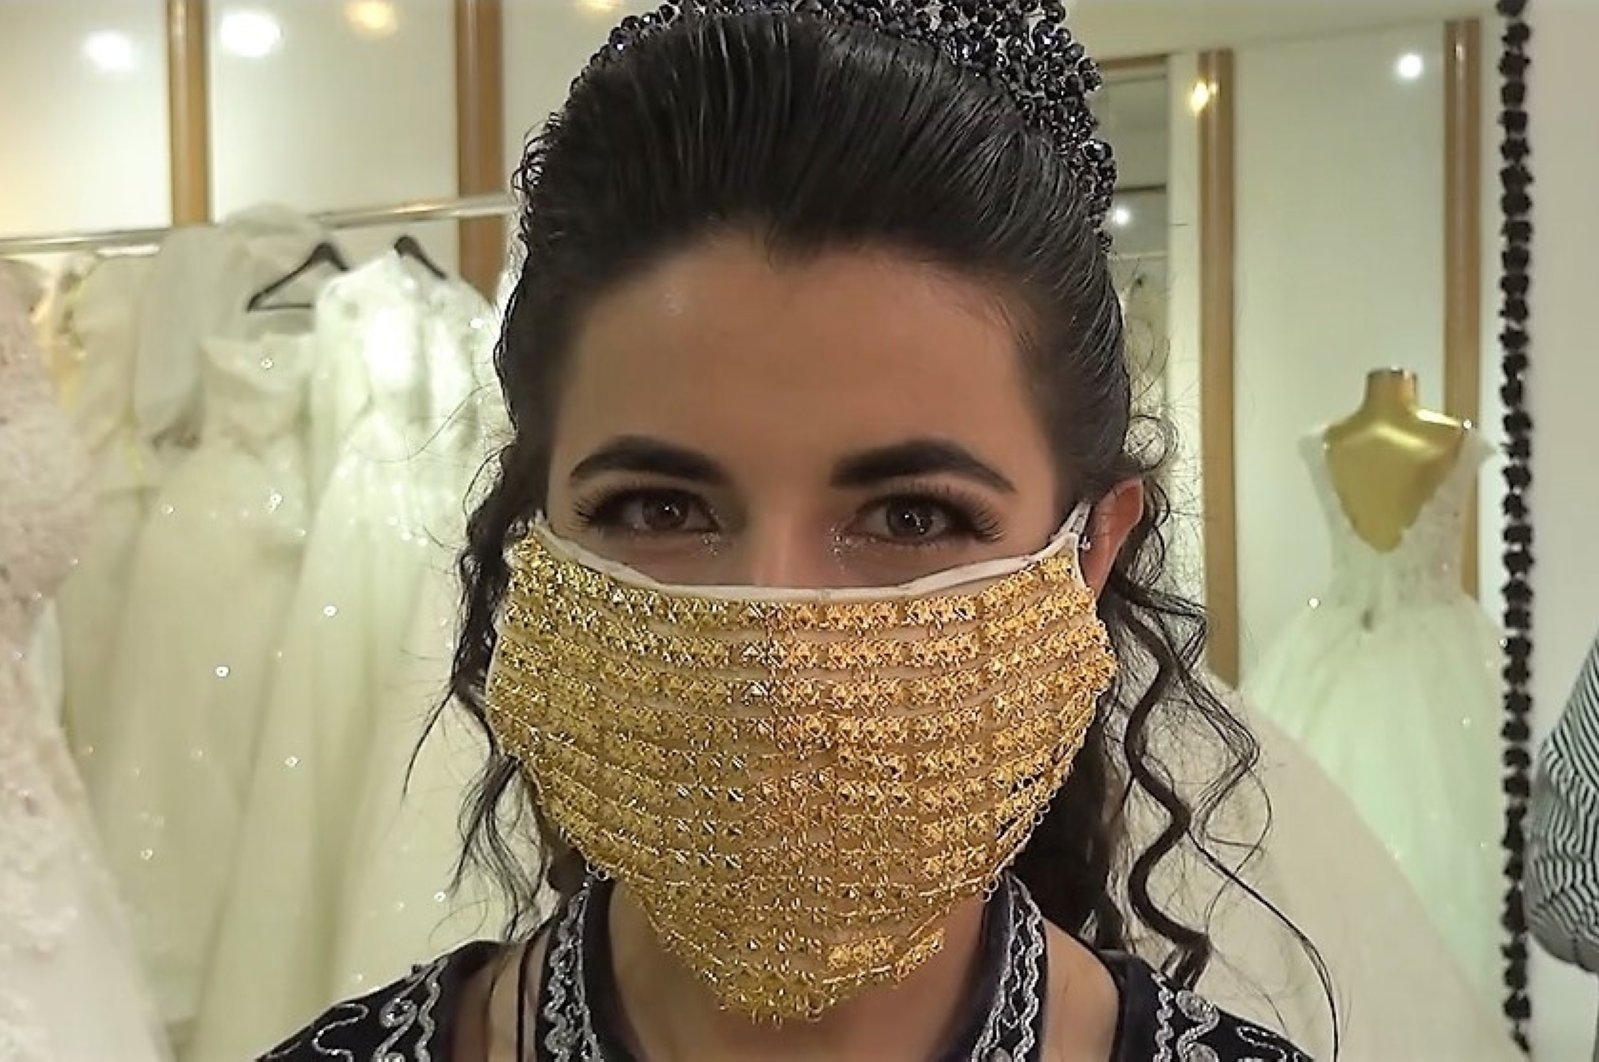 A bride sports a golden mask on her wedding day in the southeastern city of Kahramanmaraş, Turkey, Aug. 1, 2020. (IHA Photo)